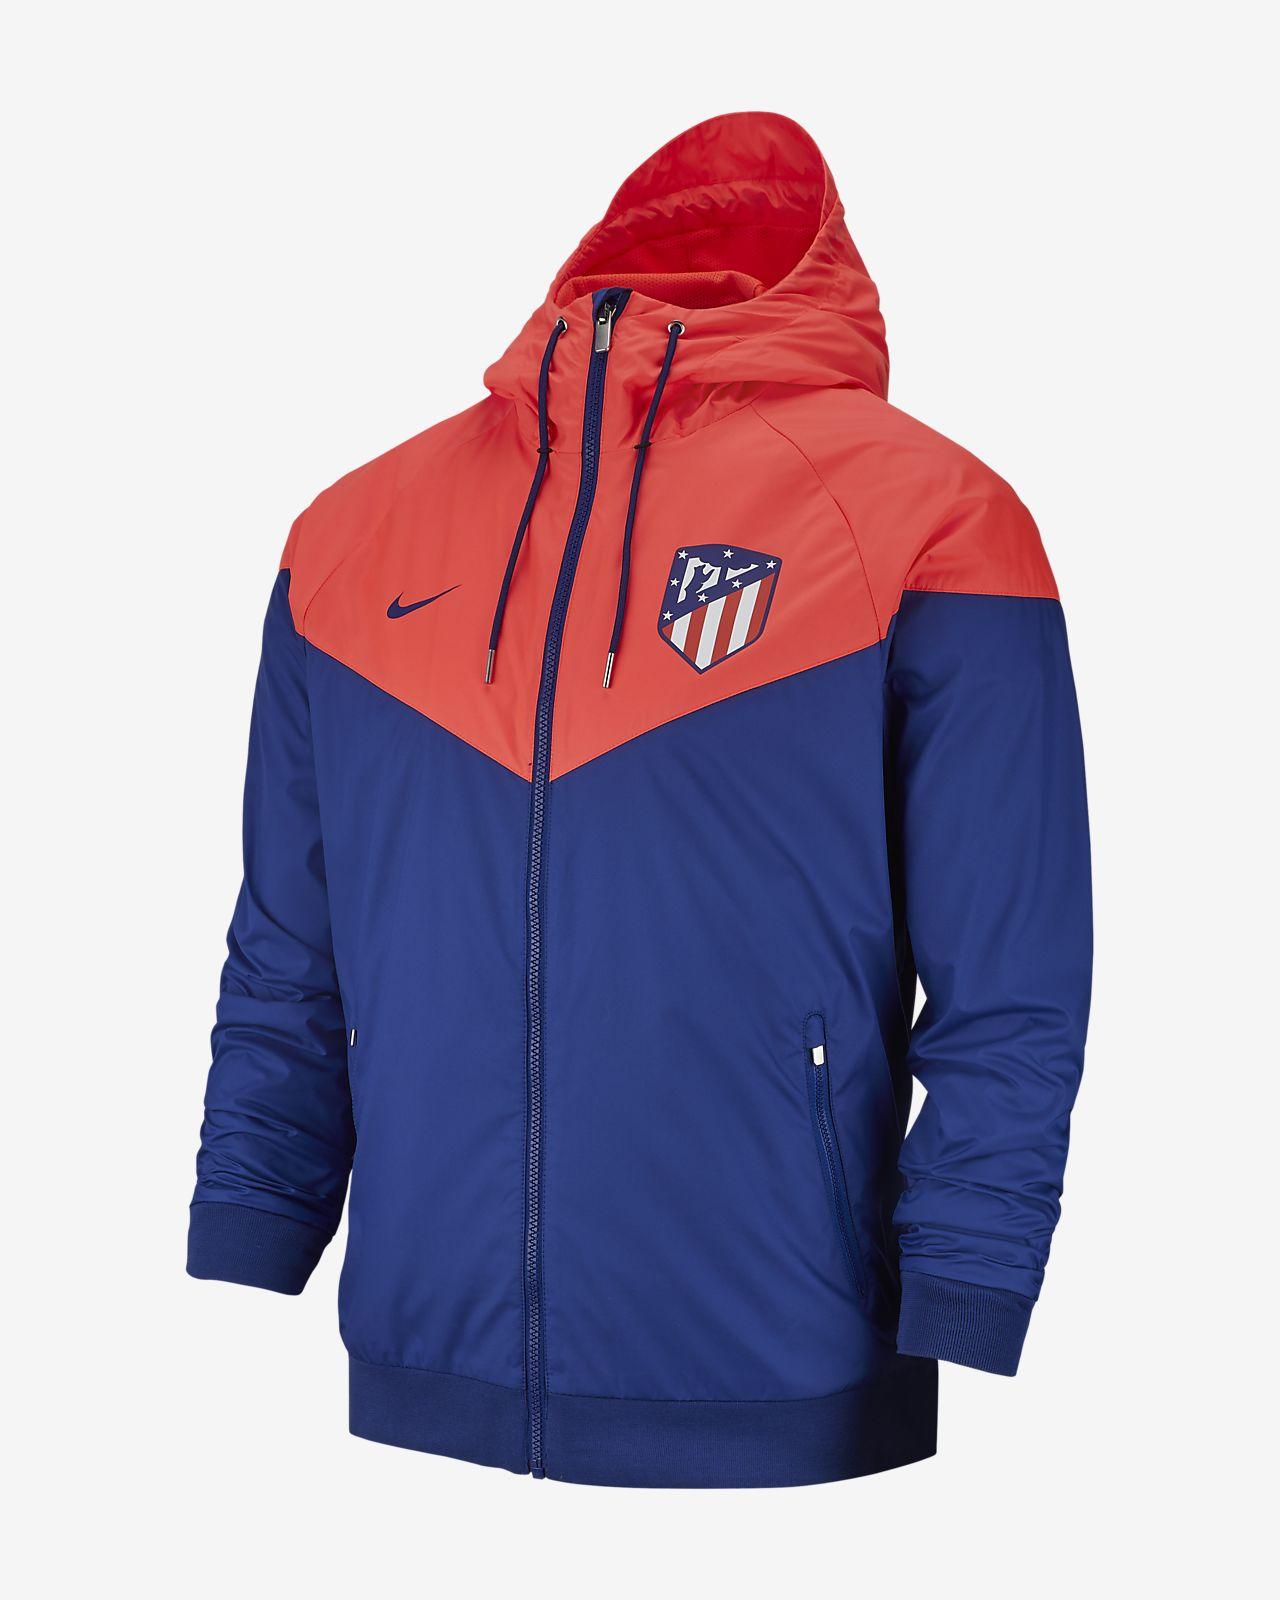 bfe52214773a4 Veste Atletico de Madrid Windrunner pour Homme. Nike.com CH